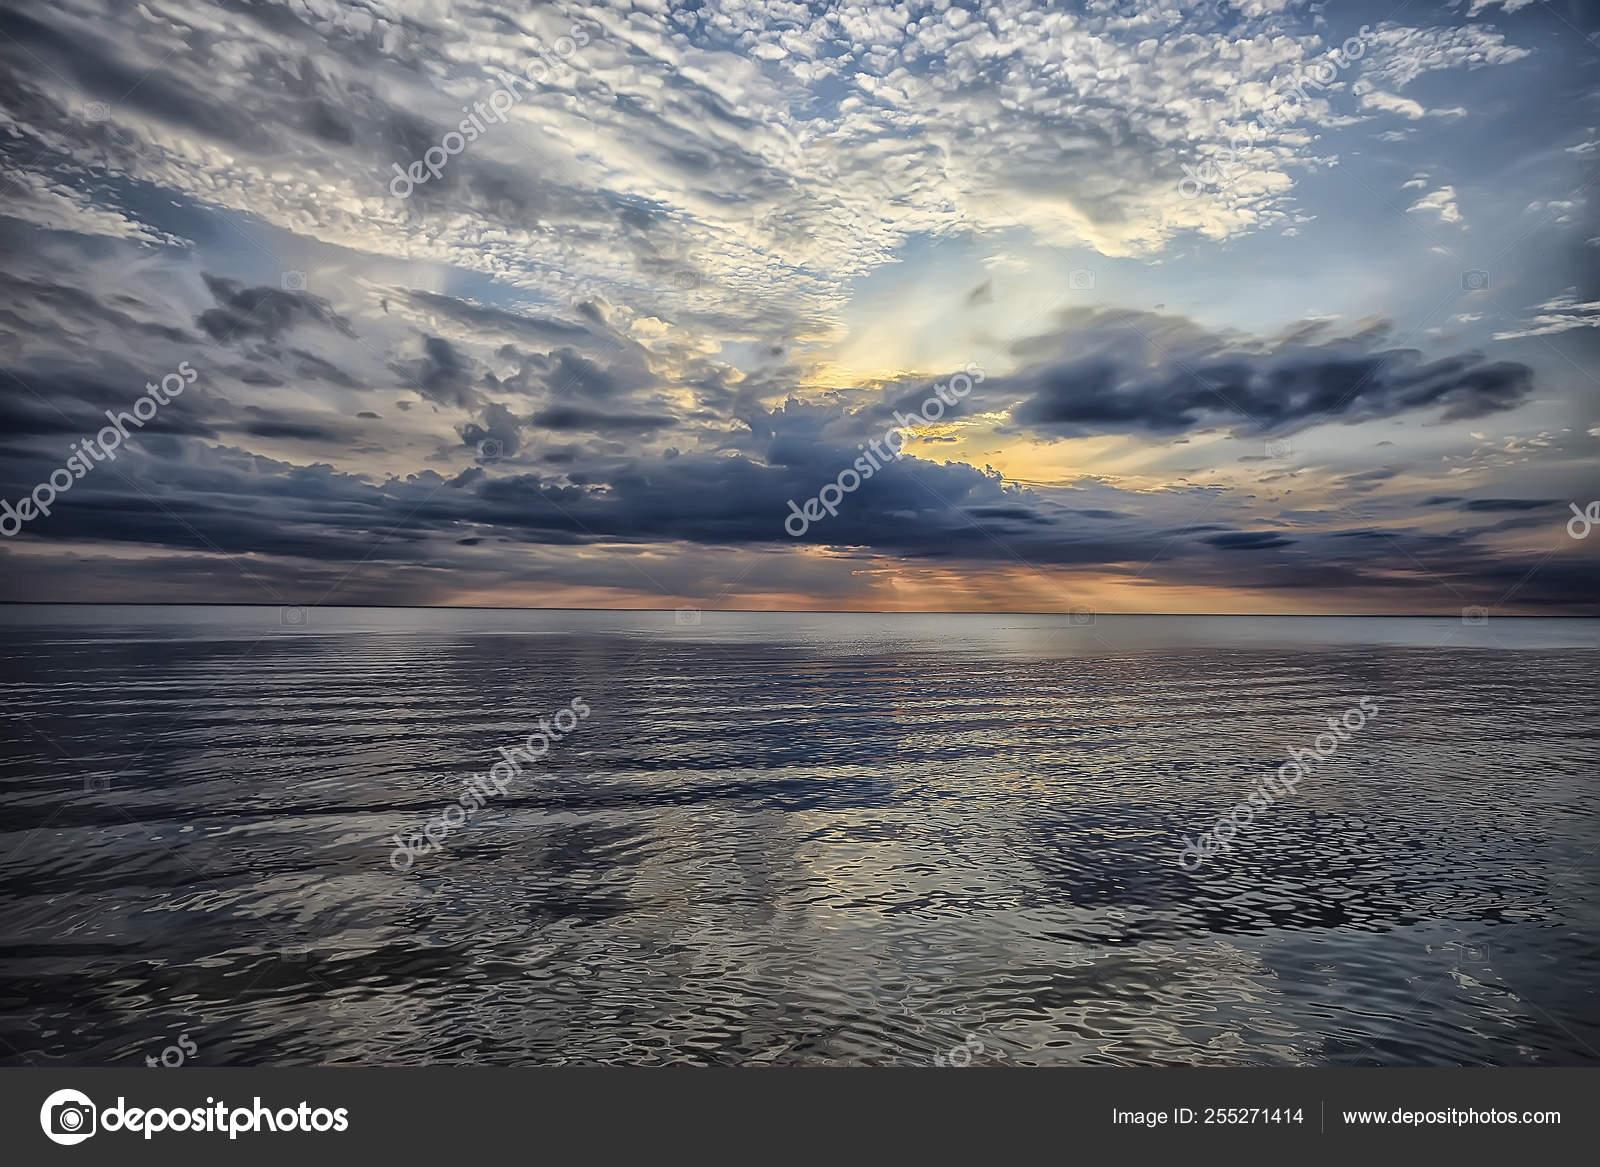 Sky Water Texture Background Horizon Sky Clouds Lake Stock Photo C Xload 255271414